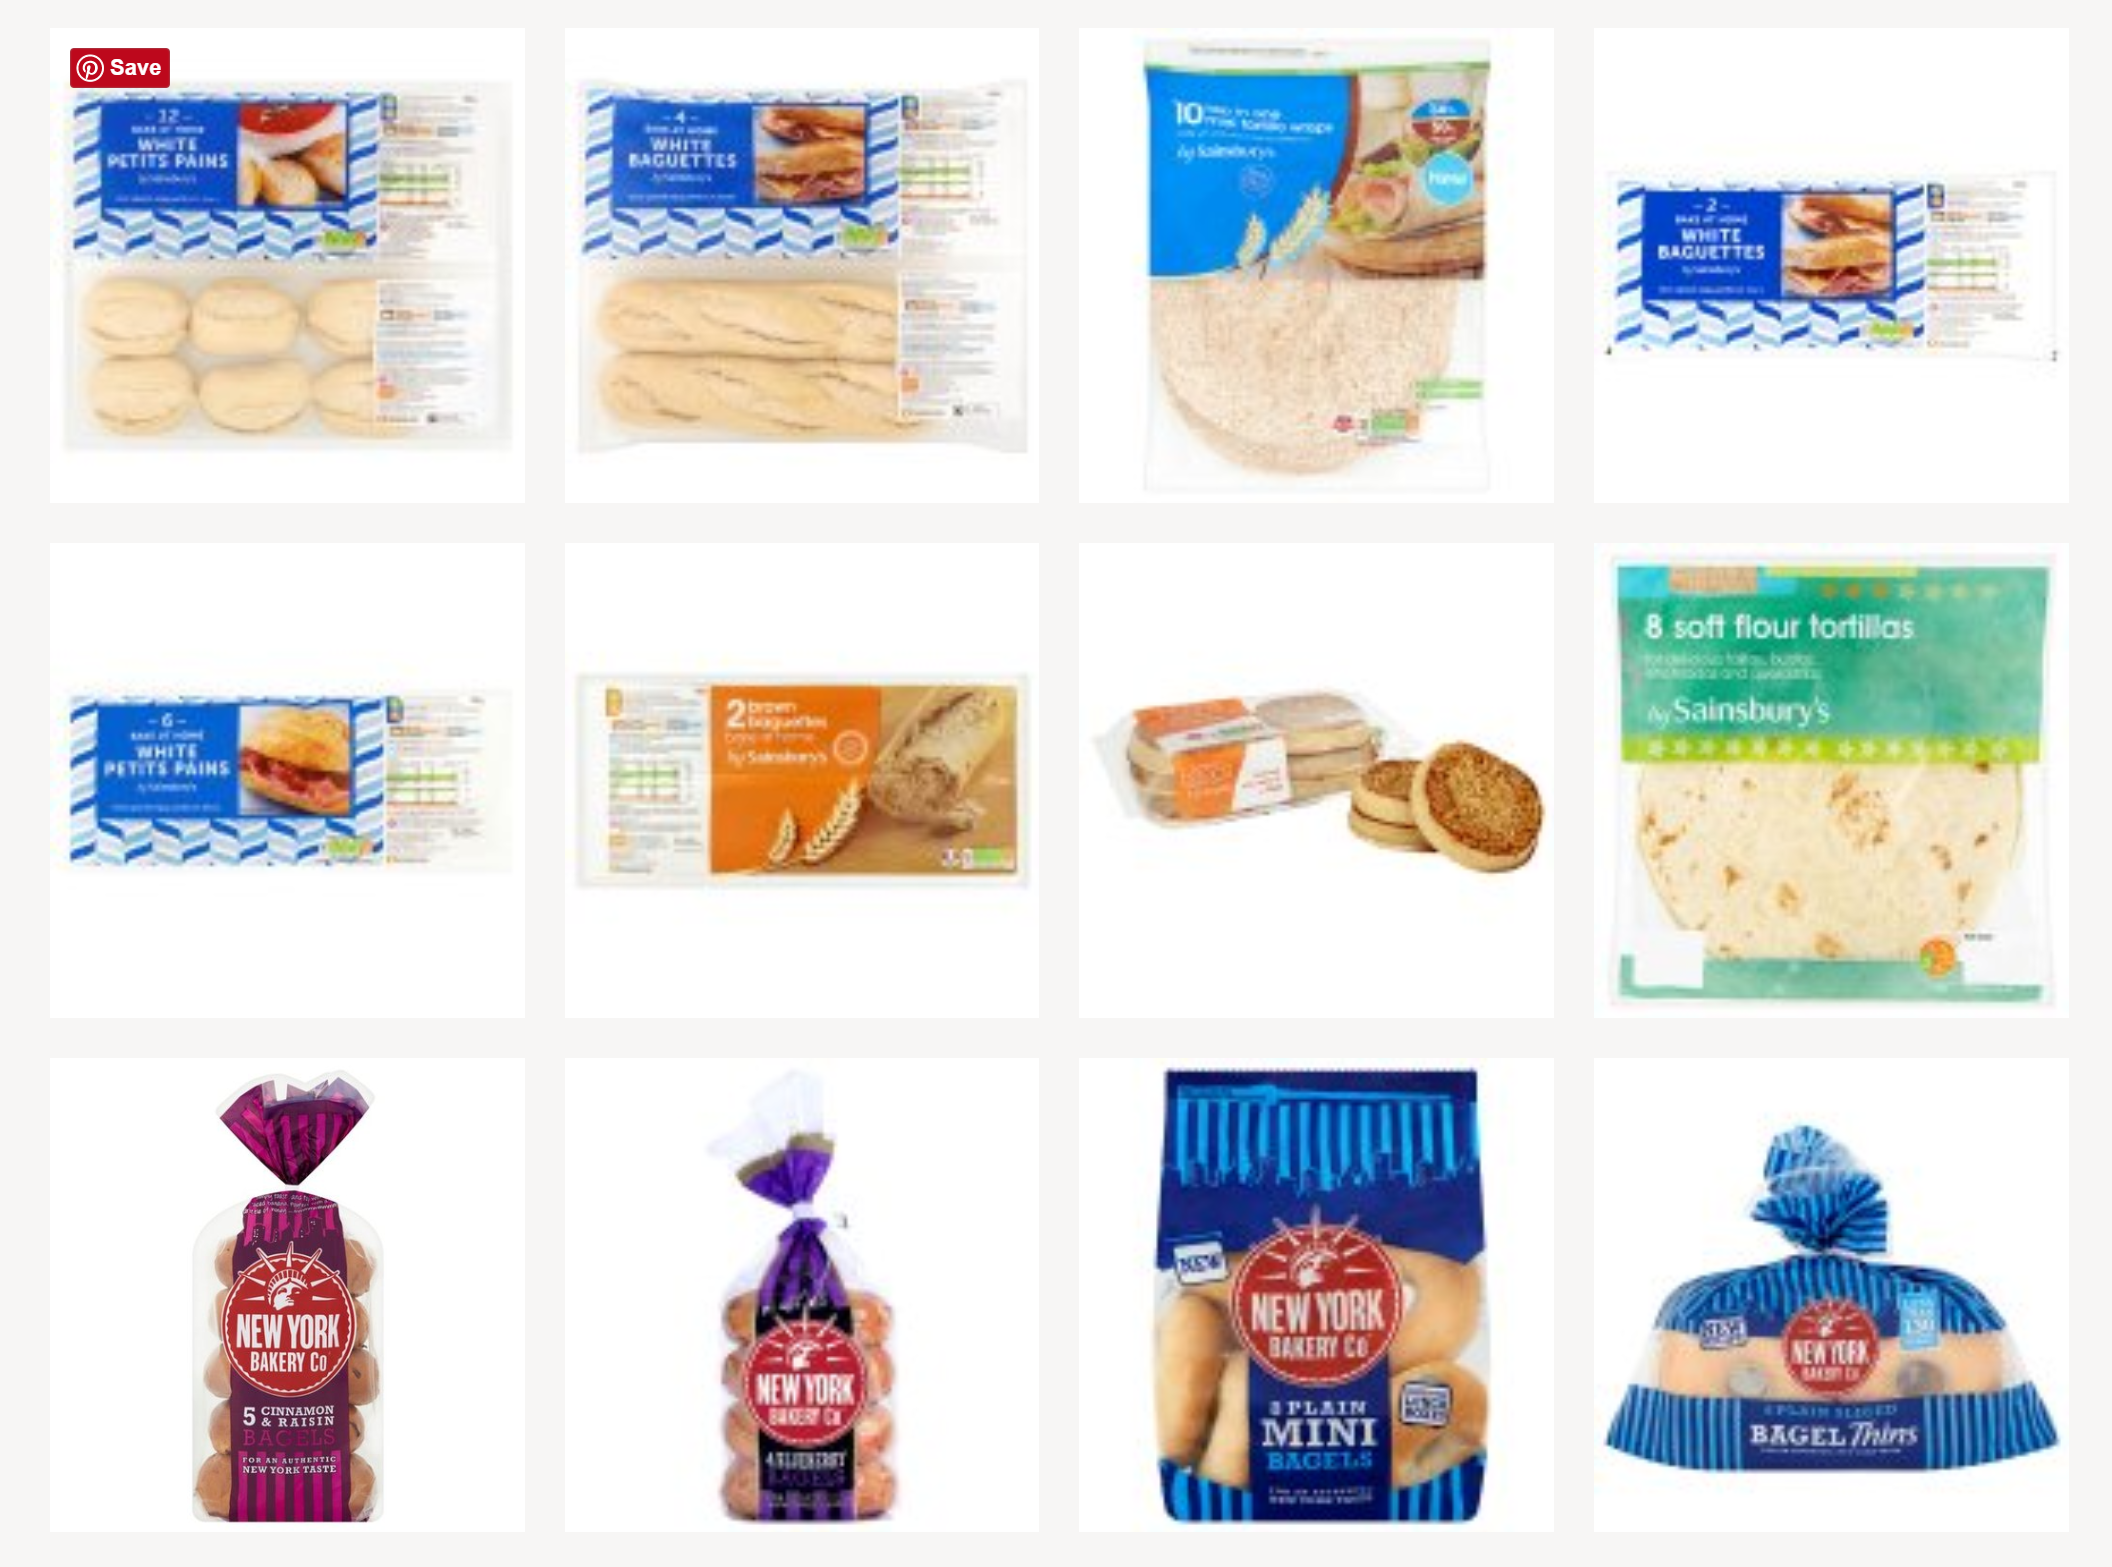 Vegan wraps, bagels and baguettes in Sainsbury's